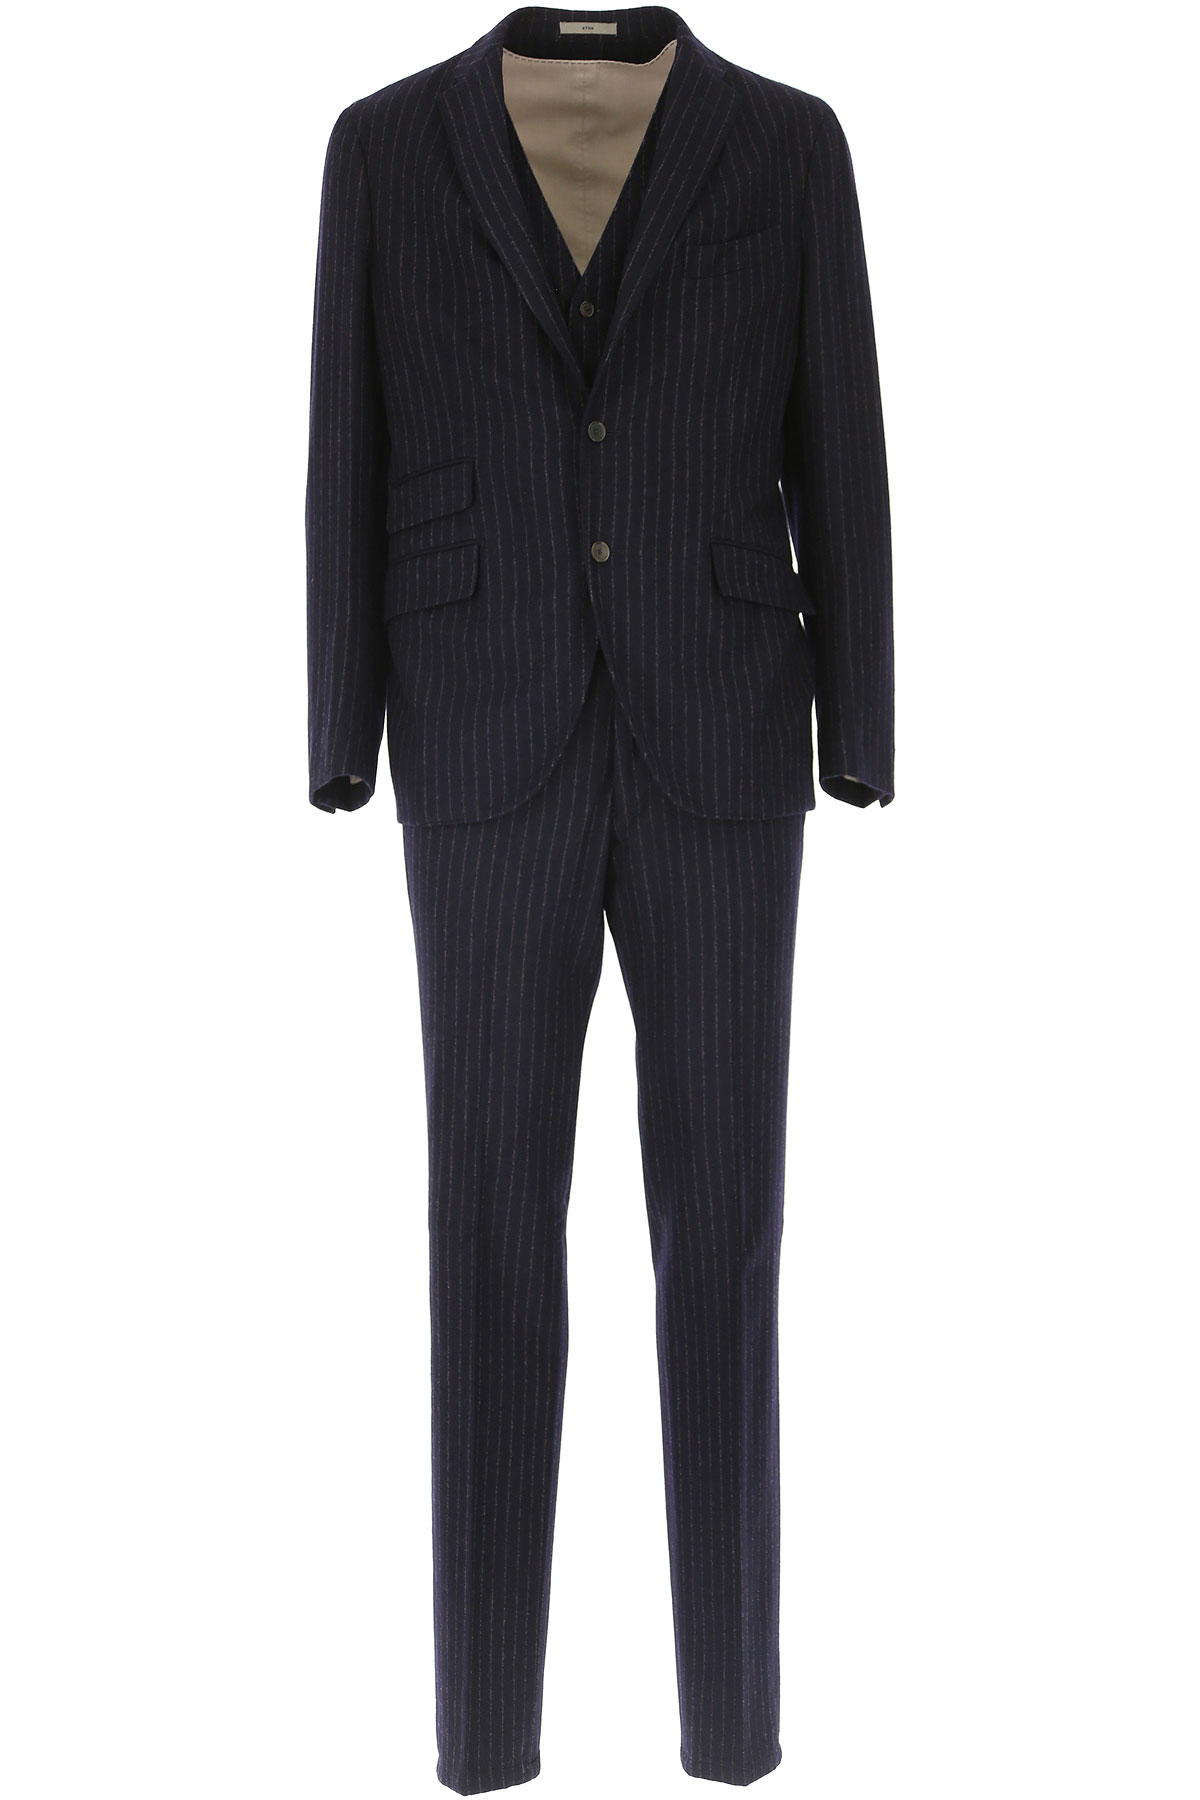 Image of Boglioli Men's Suit, Anthracite Grey, Wool, 2017, L XL